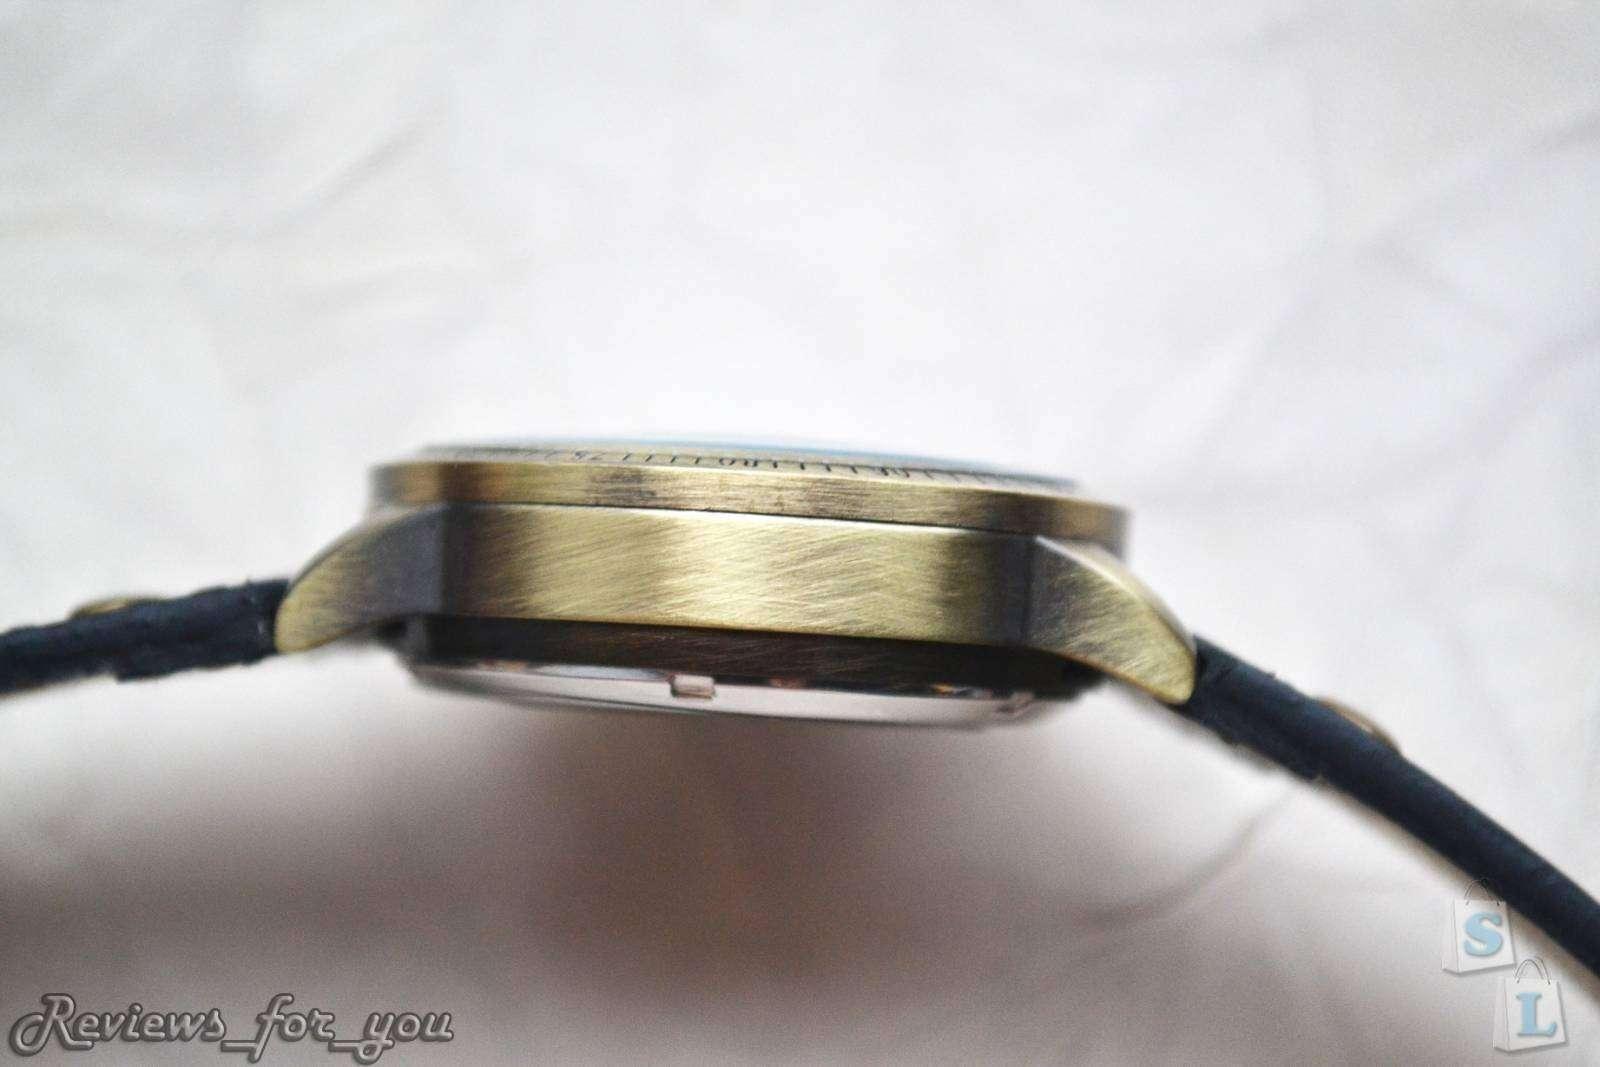 ChinaBuye: Механические мужские часы - скелетоны SHENHUA